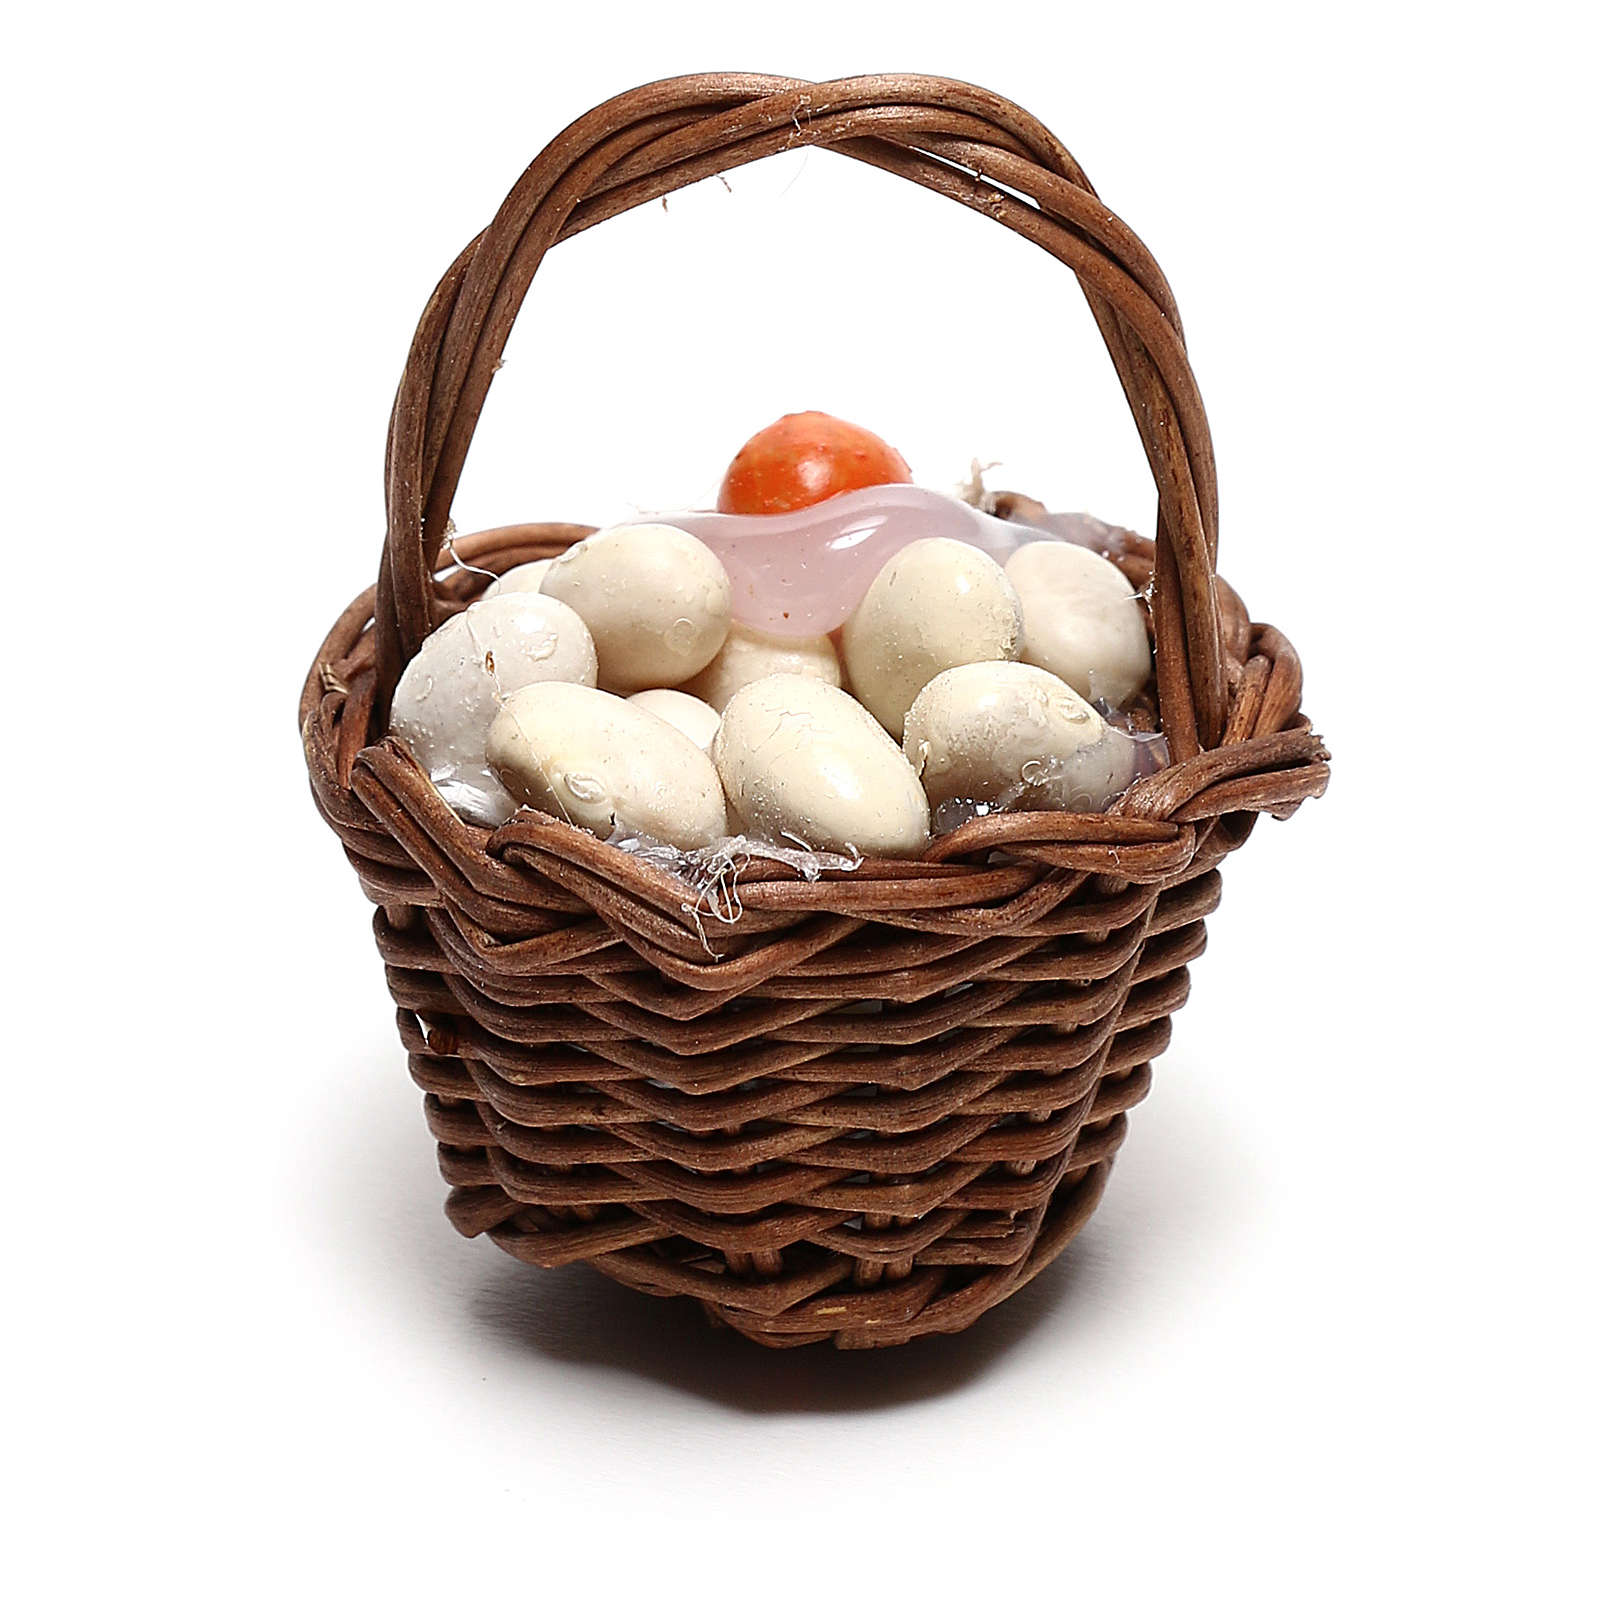 Basket with eggs for Neapolitan Nativity scene of 12 cm 4